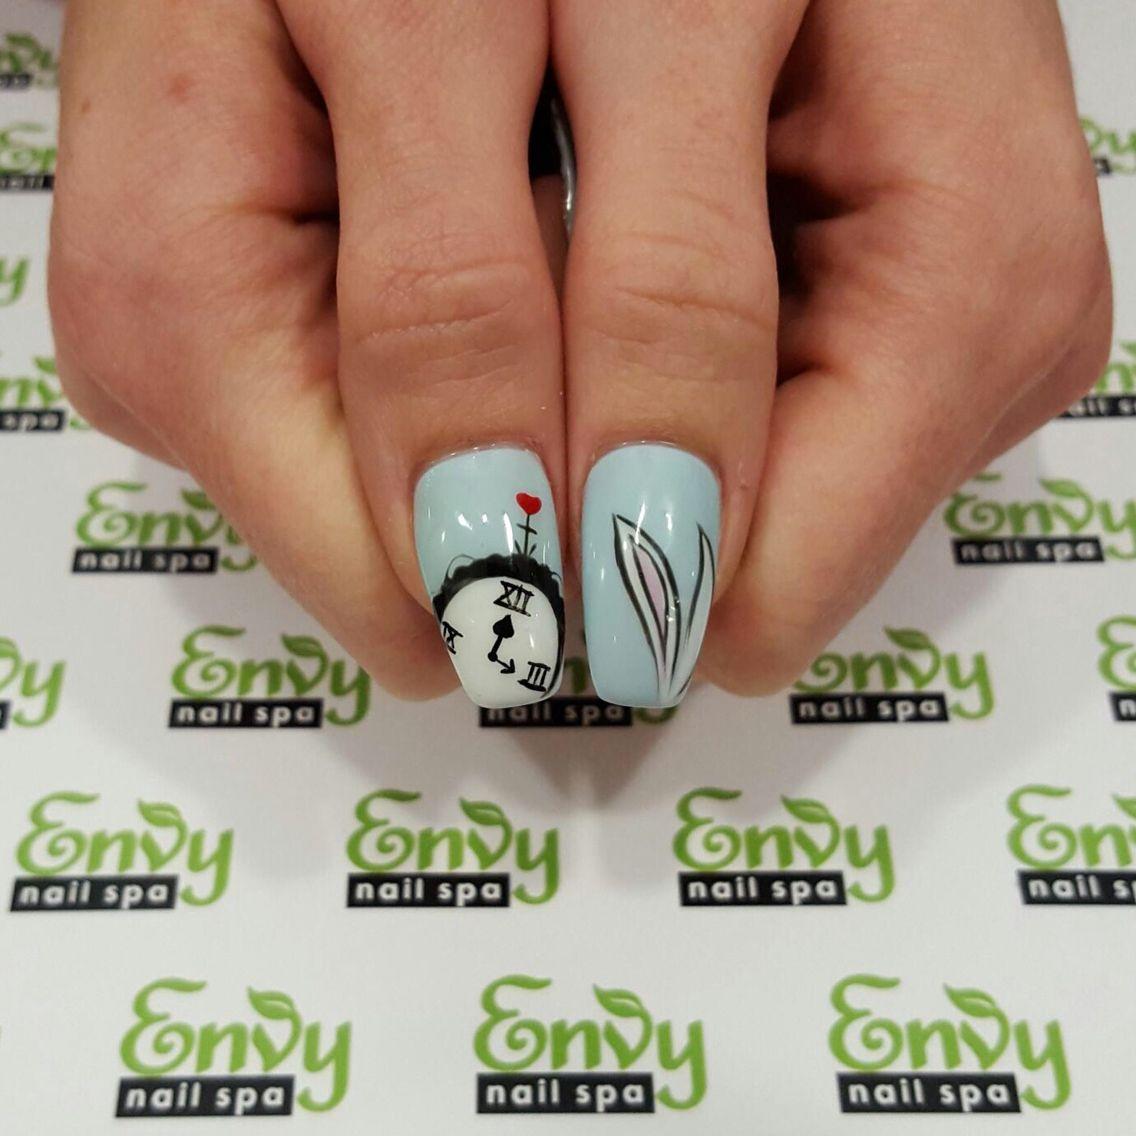 Disney Alice In Wonderland Nails - Envy Nail Spa | Cartoon ...